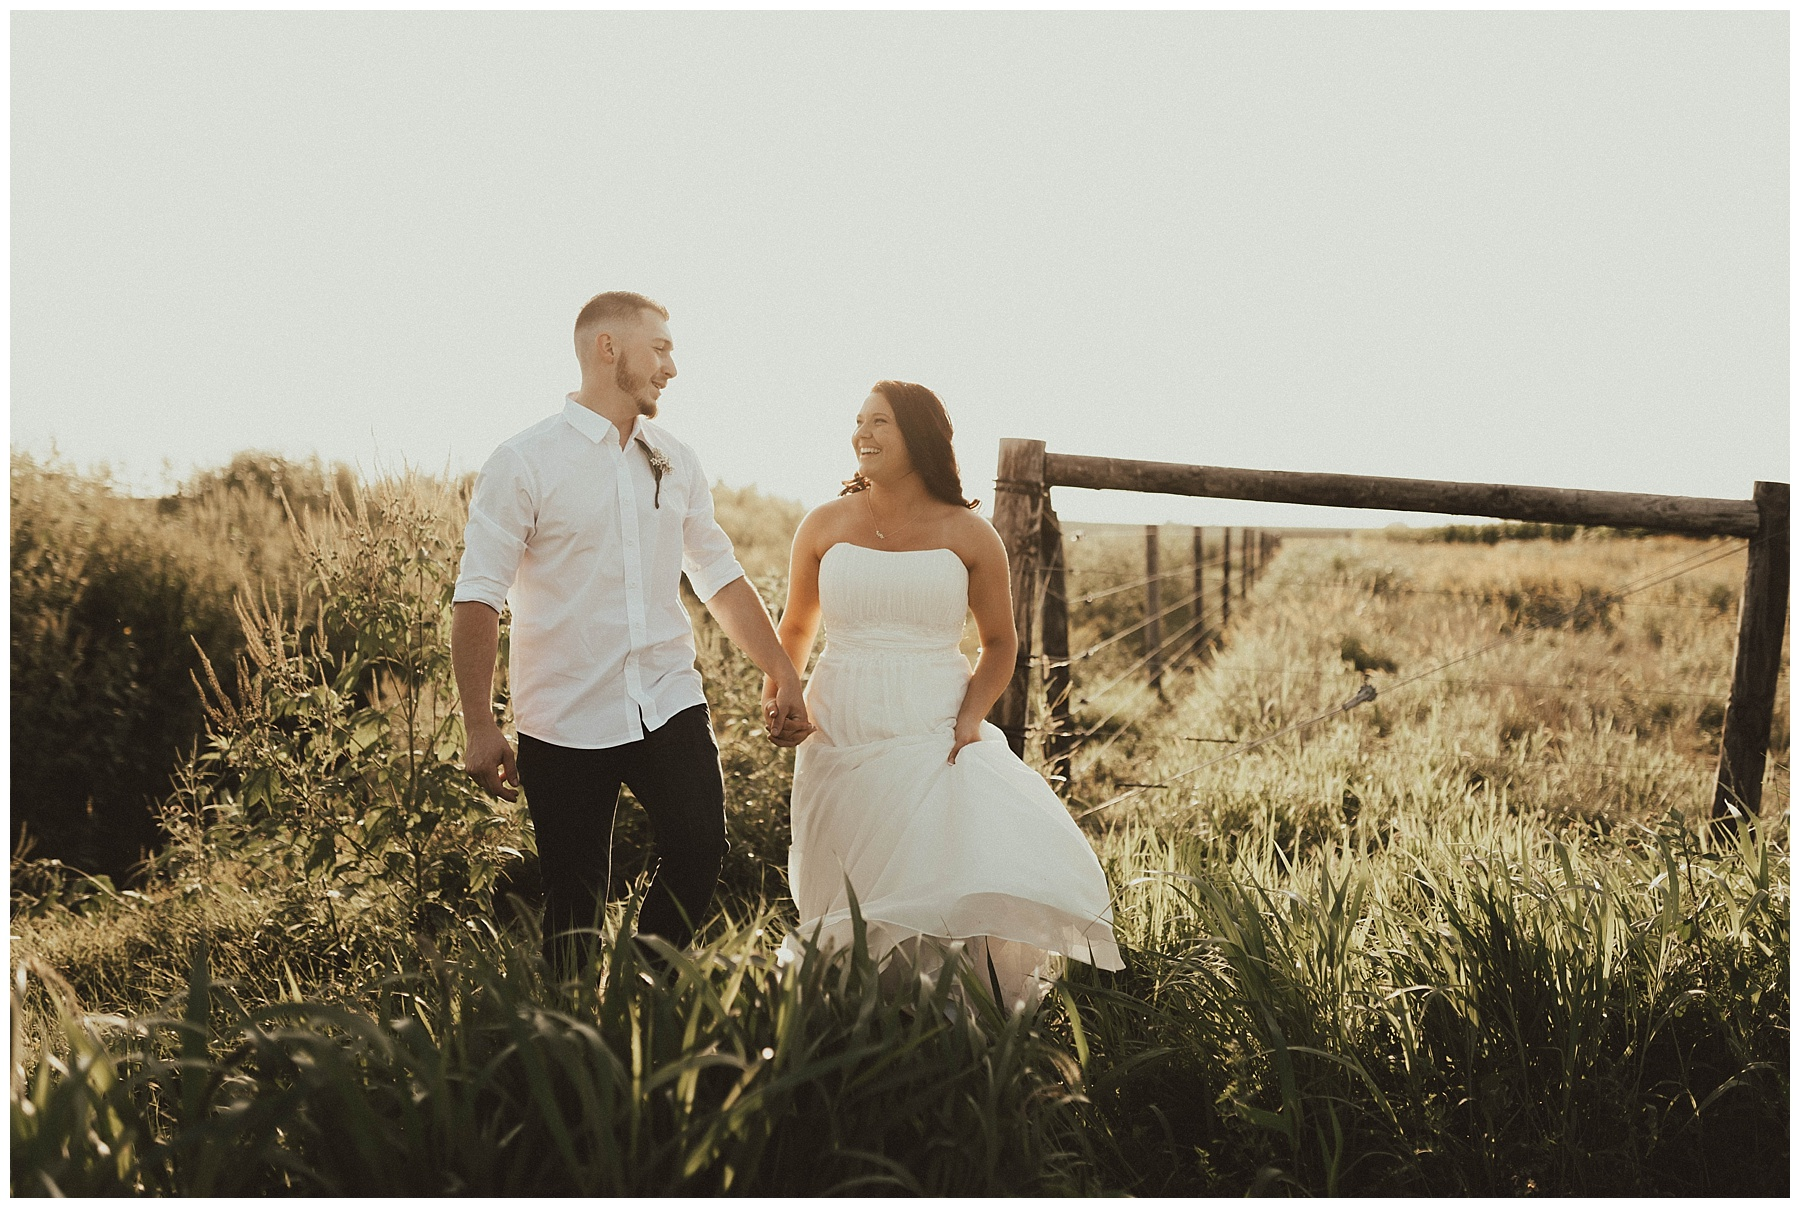 Devan Molly Midwest Bridals Lauren F Otography Central Illinois Wedding Photographer Chicago Wedding Photographer Peoria Il Wedding Photographer